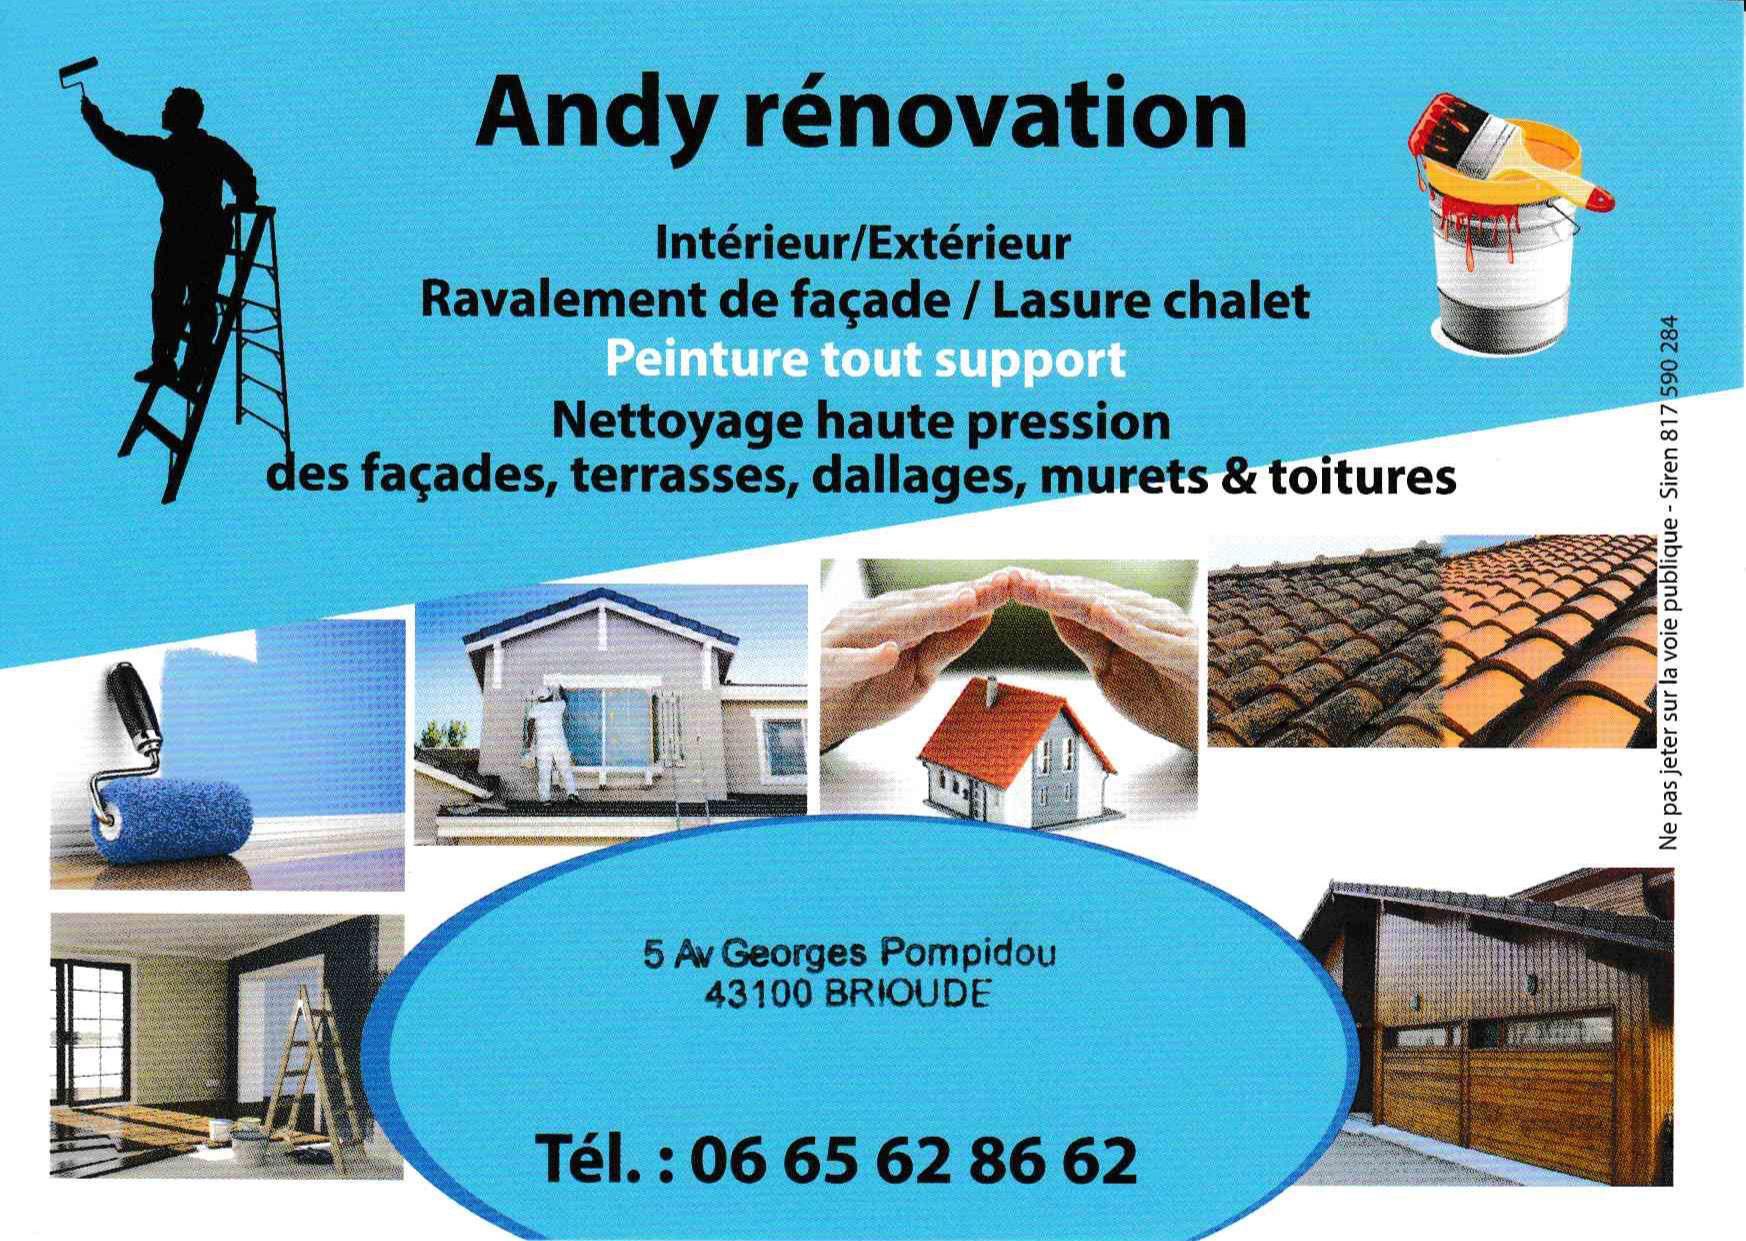 Andy Rénovation rénovation immobilière